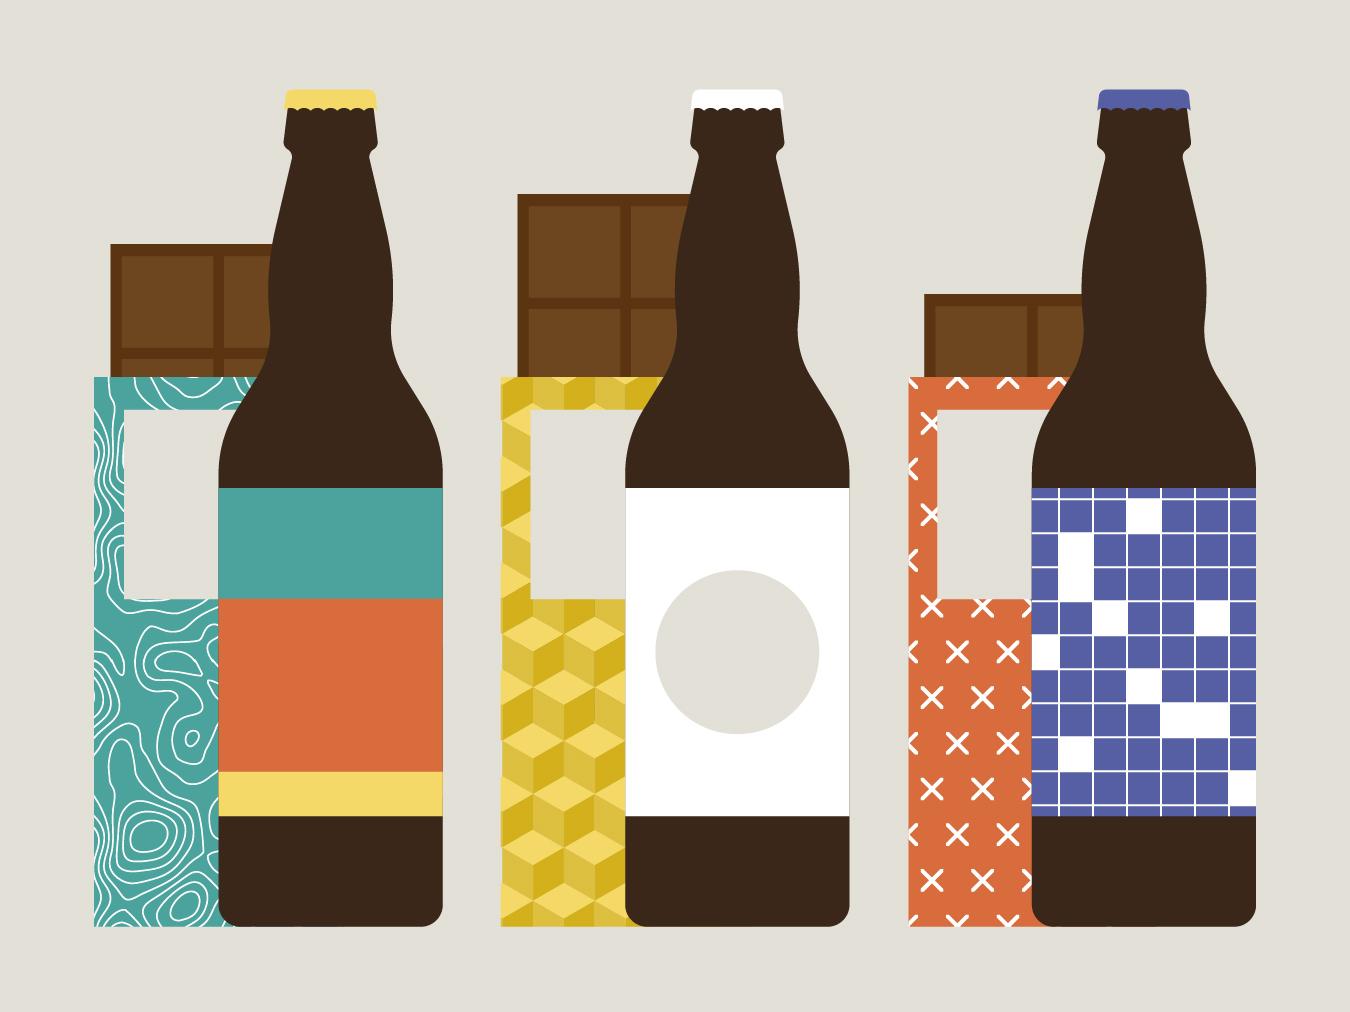 beer and chocolate pairings